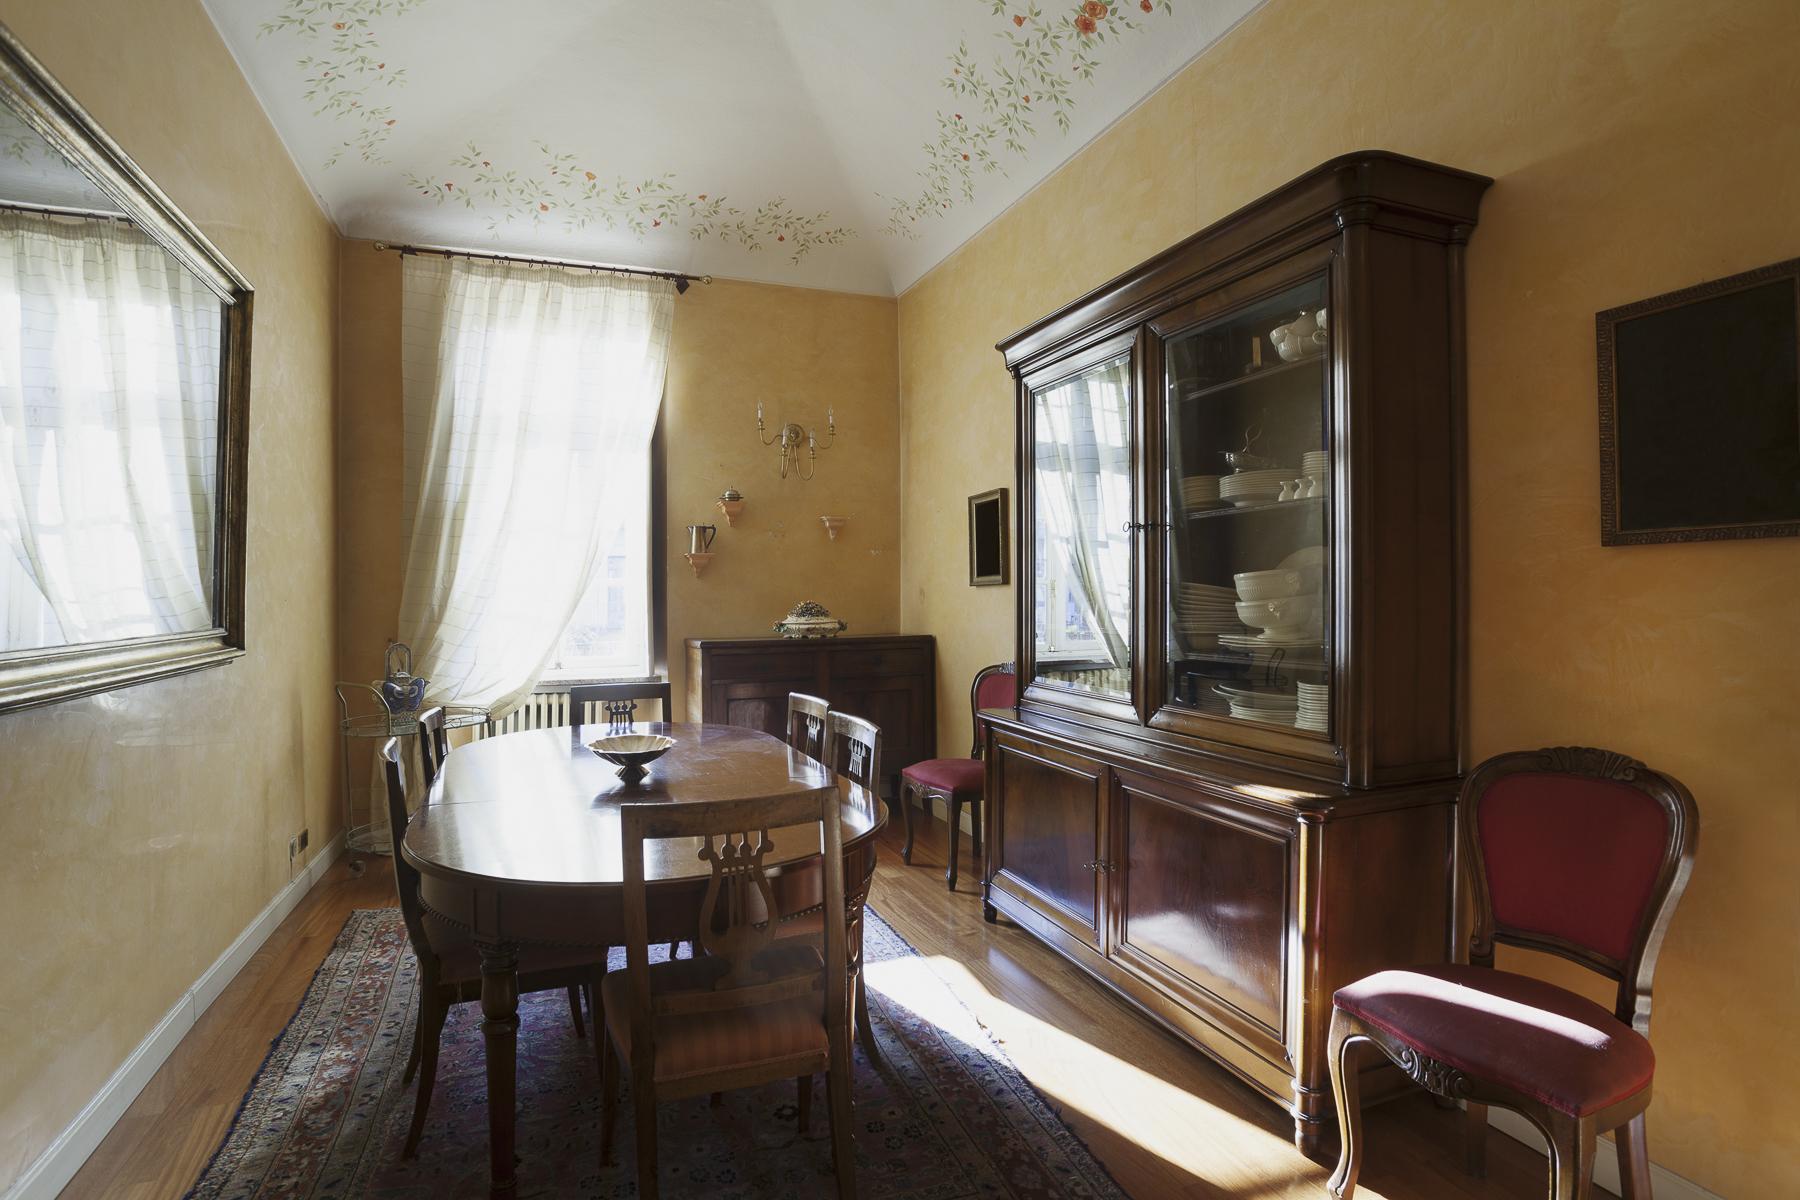 Additional photo for property listing at Elegant apartment in Piazza Vittorio Piazza Vittorio Veneto Torino, Turin 10124 Italien